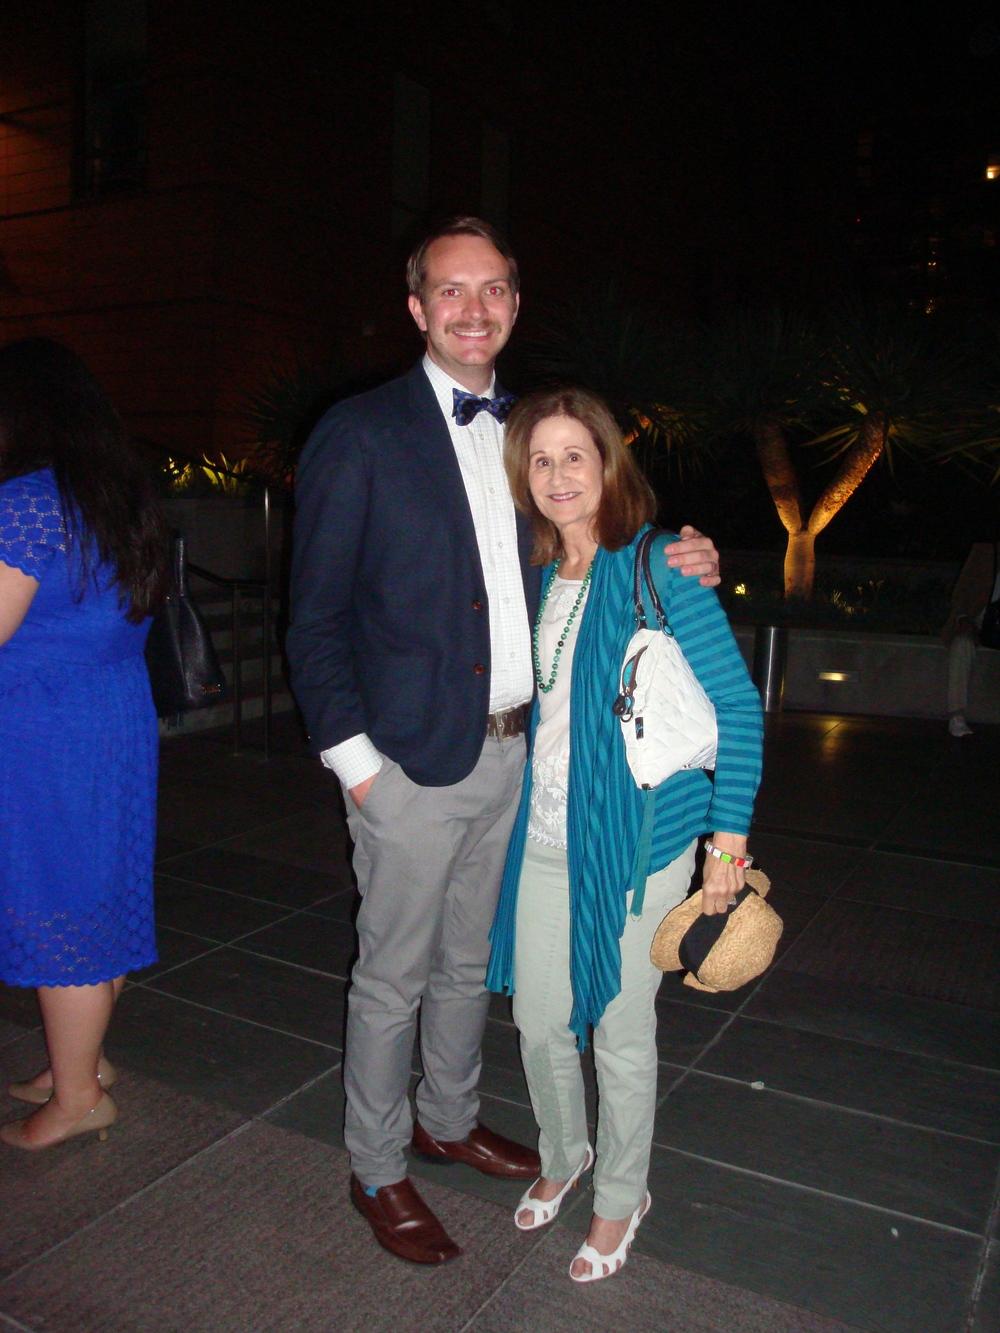 Derek Purdy and Doris Koplik Directors of Media Relations Long Beach Opera